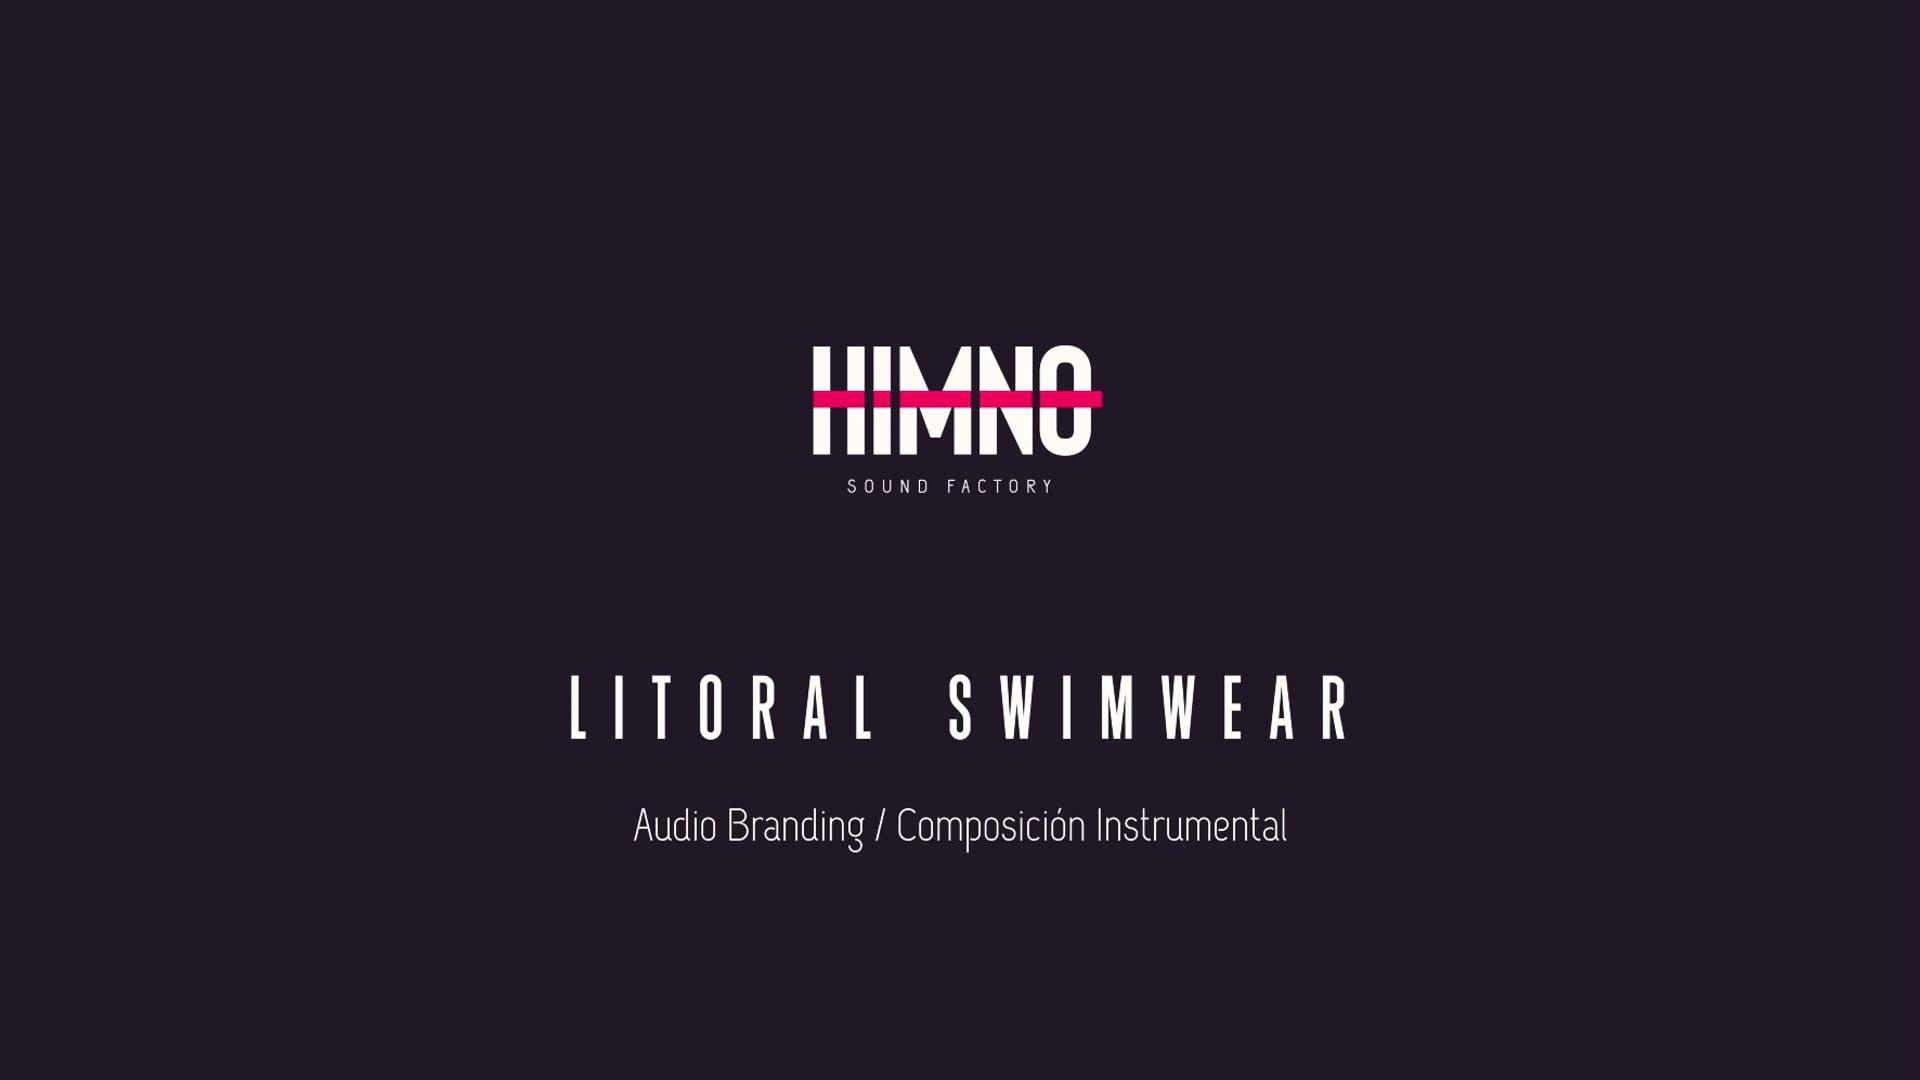 LITORAL Audio Branding